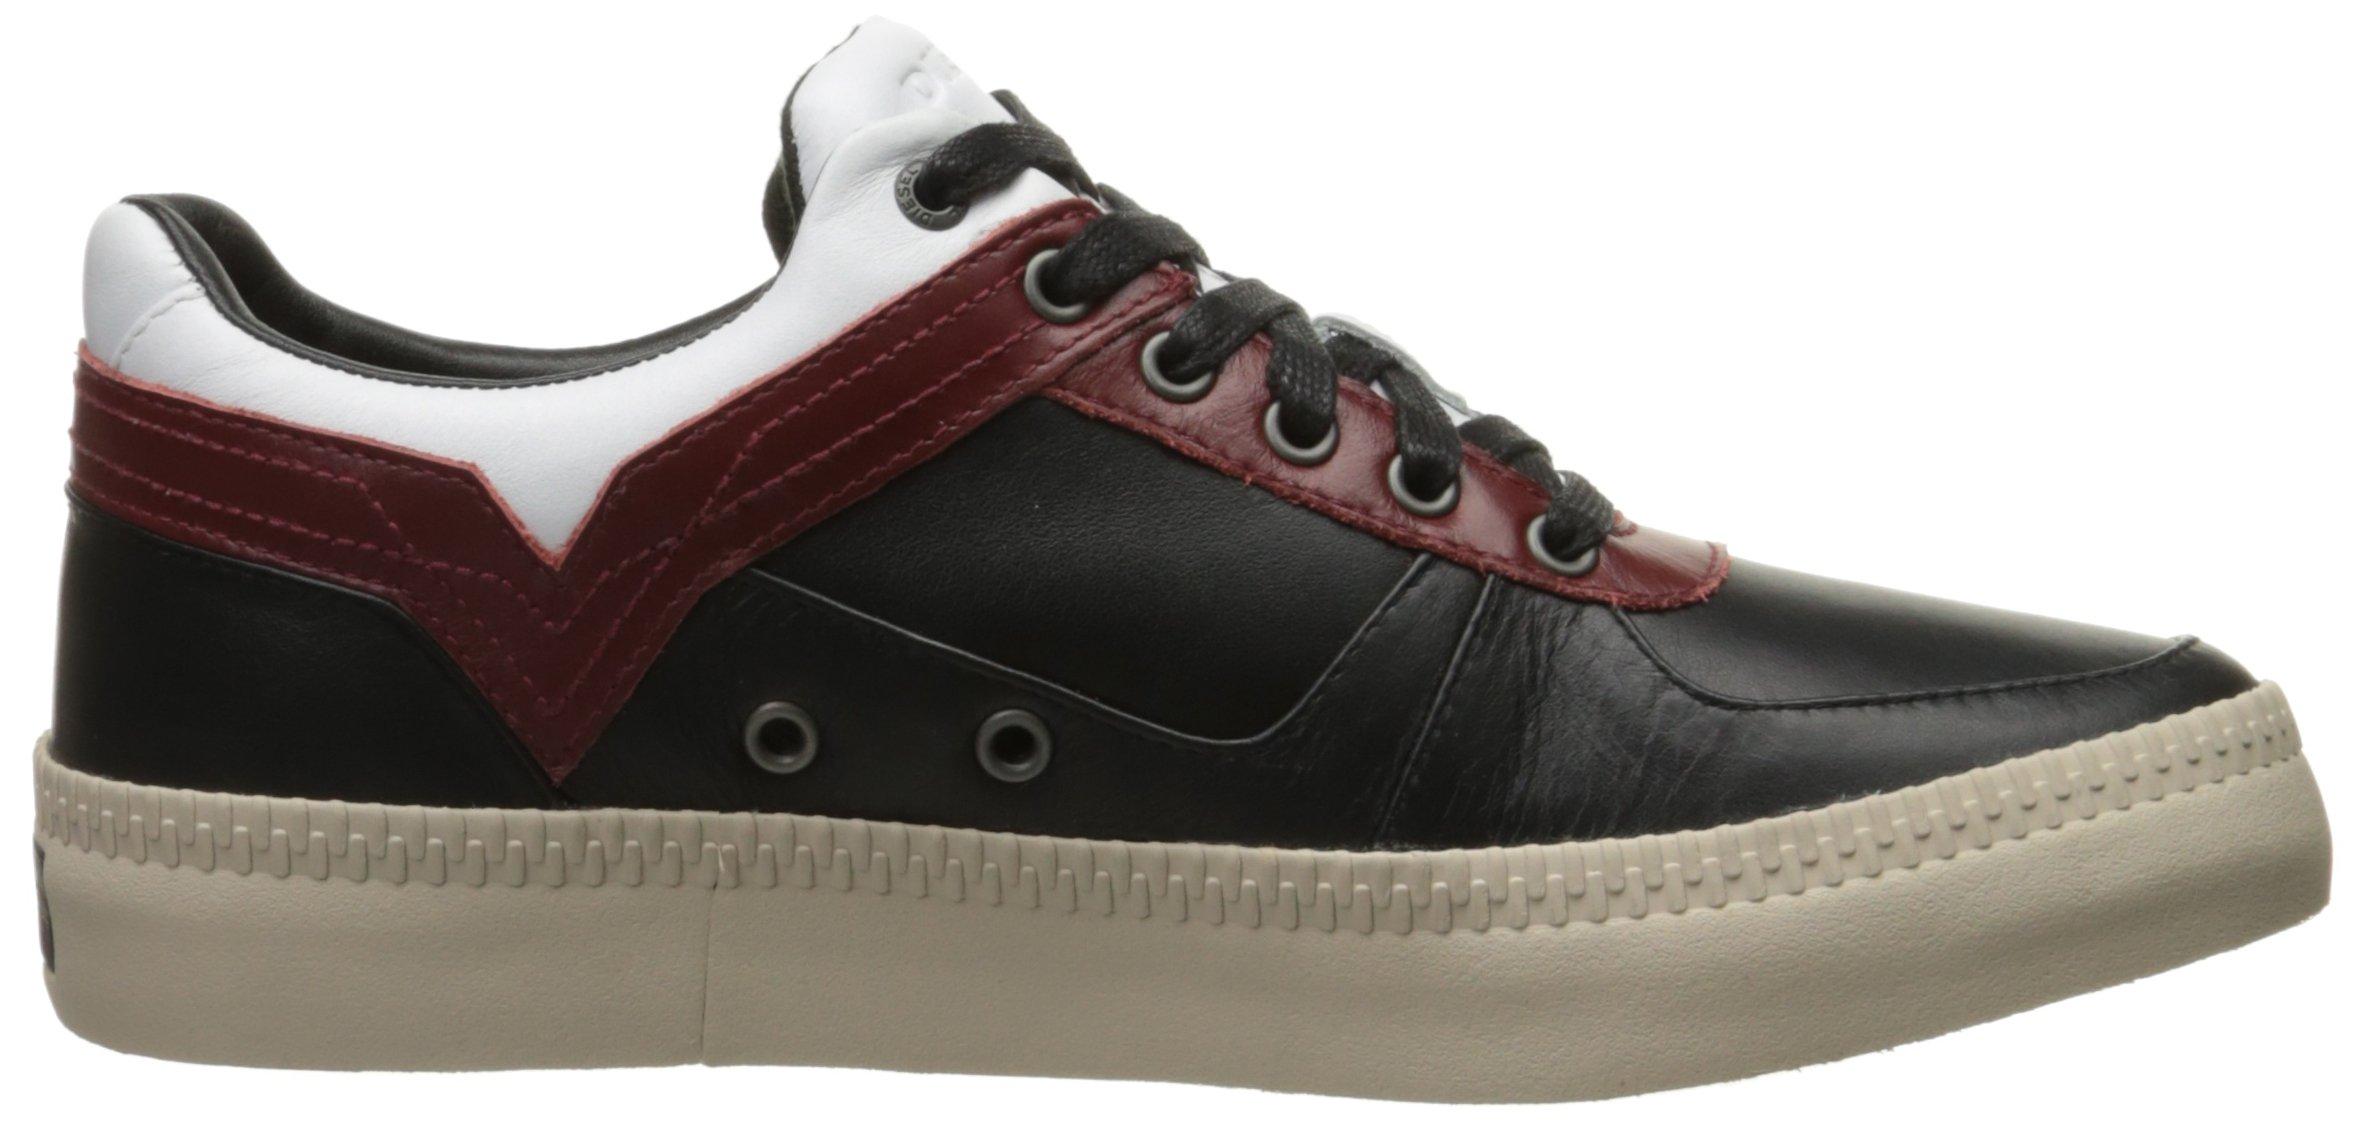 Diesel Men's V S-Spaark Low Fashion Sneaker, Black/White/Biking Red, 10.5 M US by Diesel (Image #7)